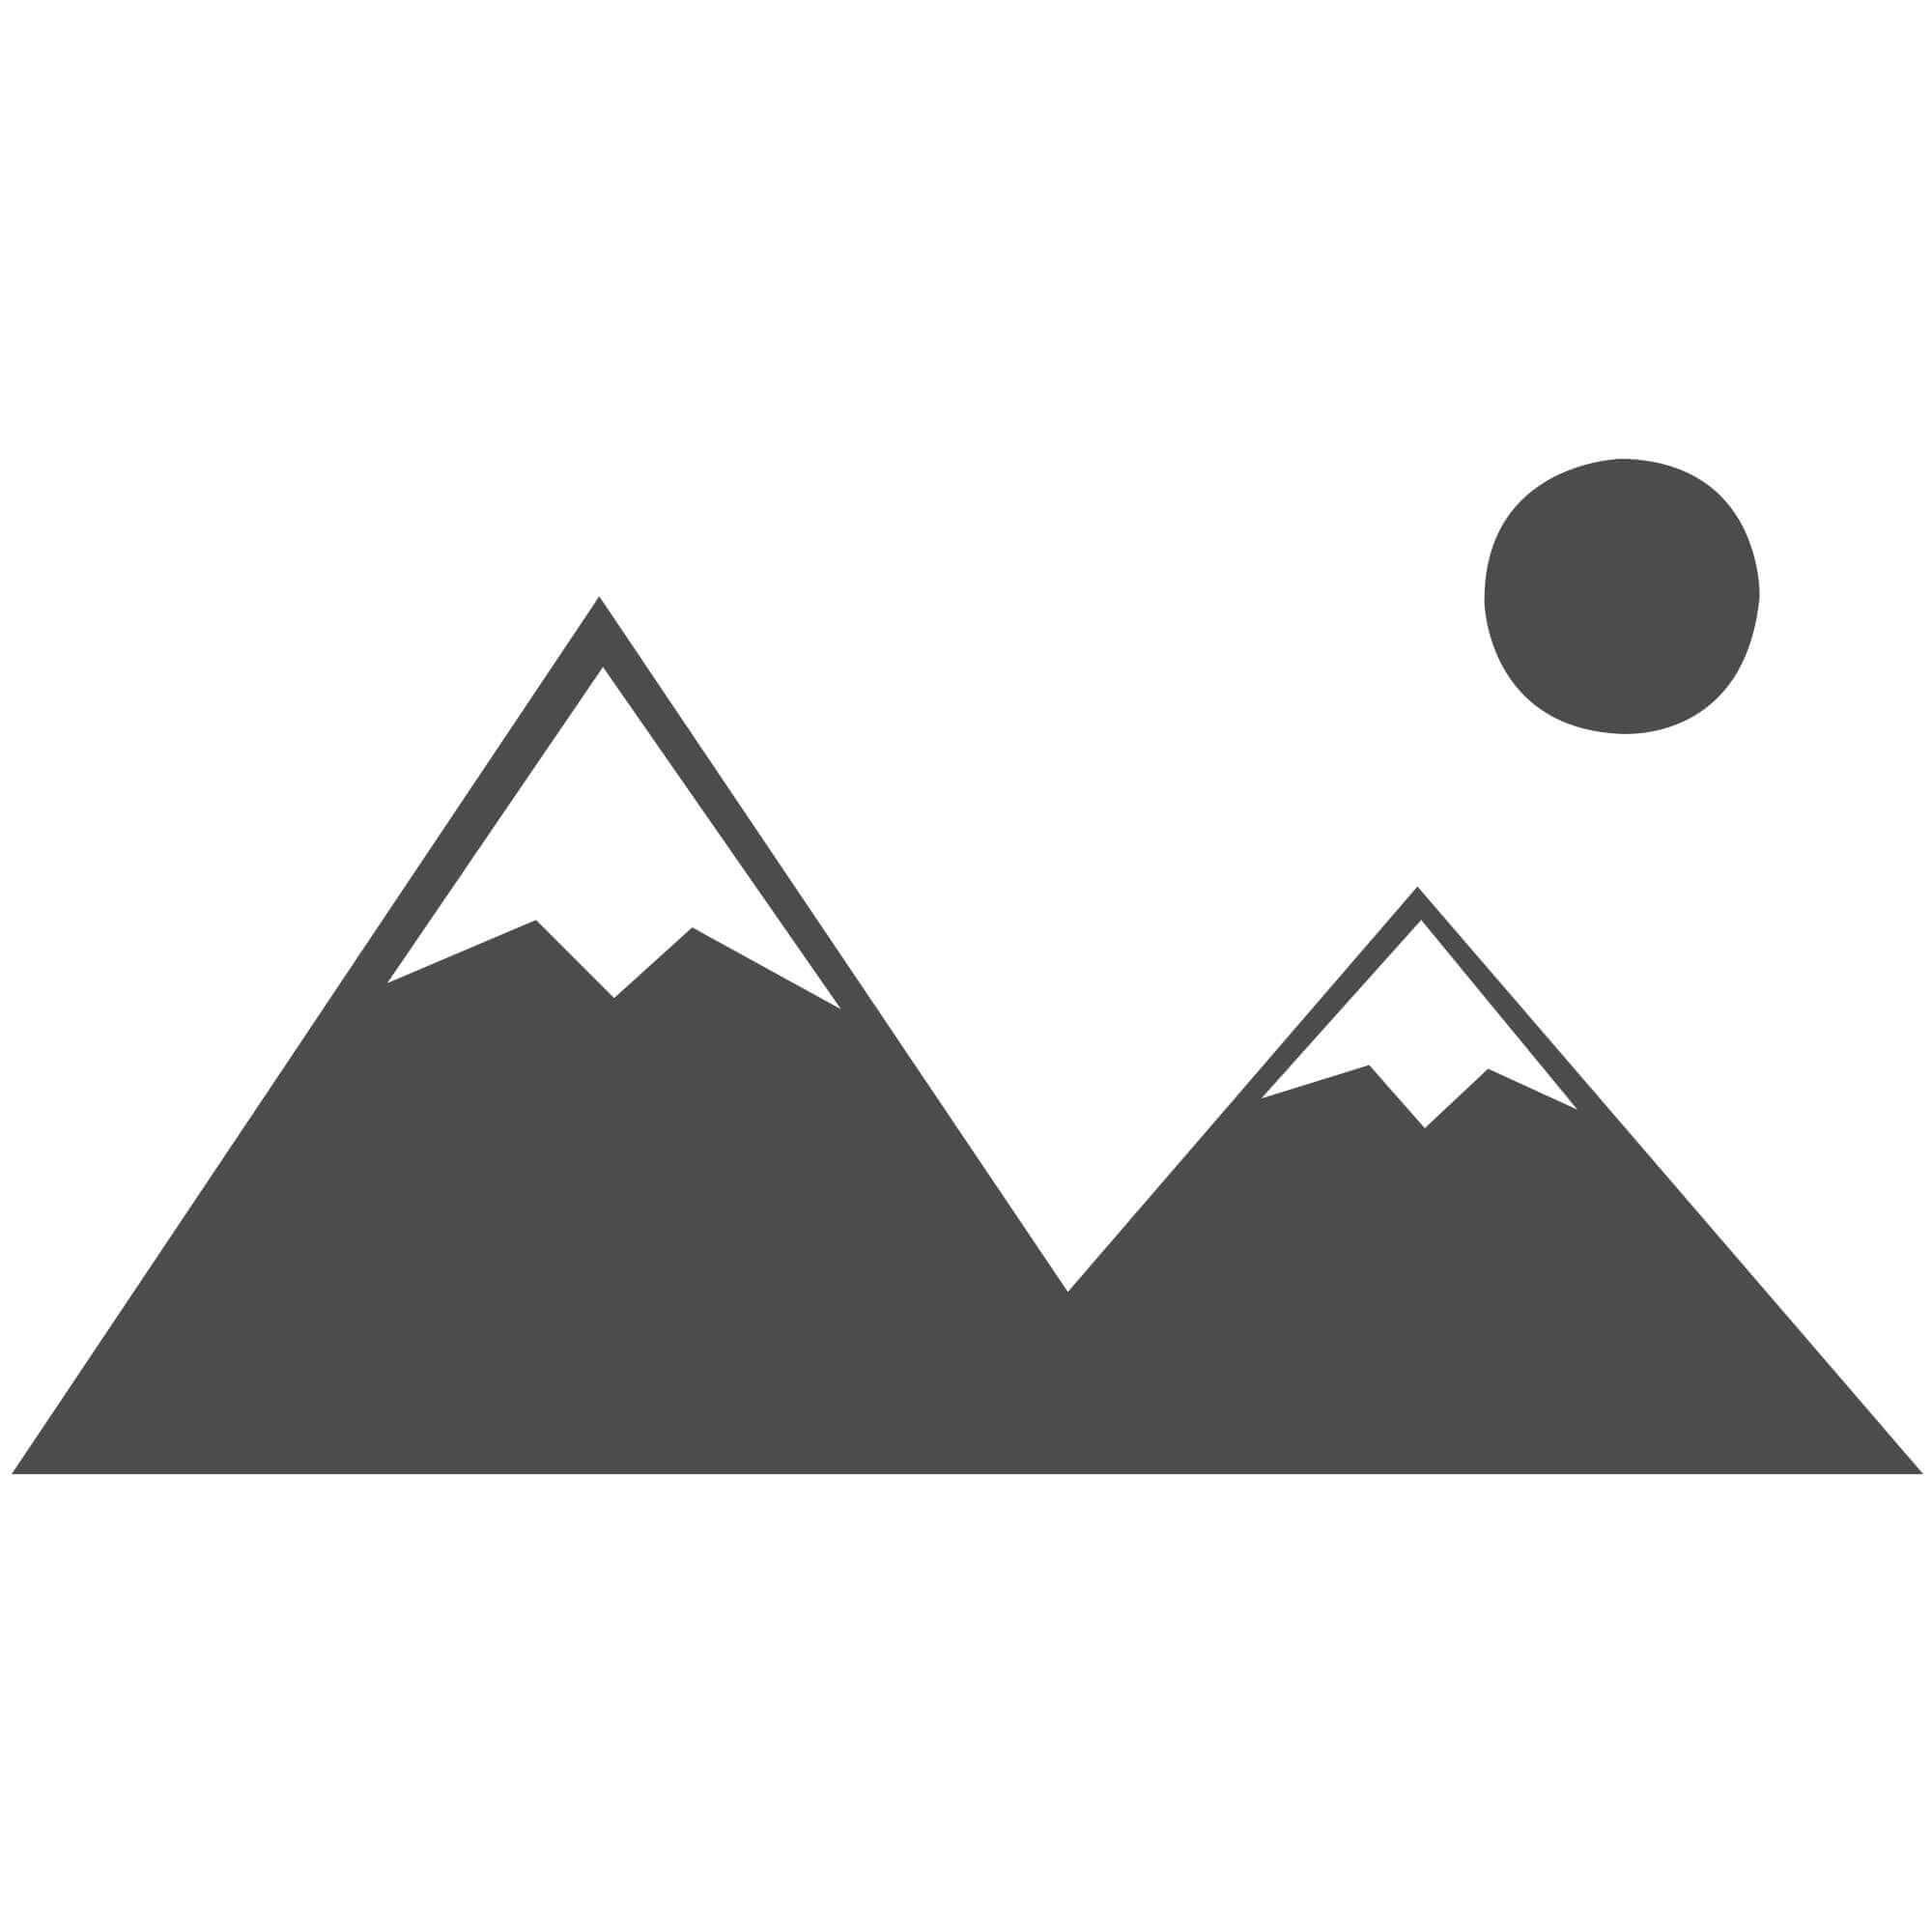 "Serenity Super-Soft Shaggy - Mink - Size 80 x 150 cm (2'8"" x 5')"